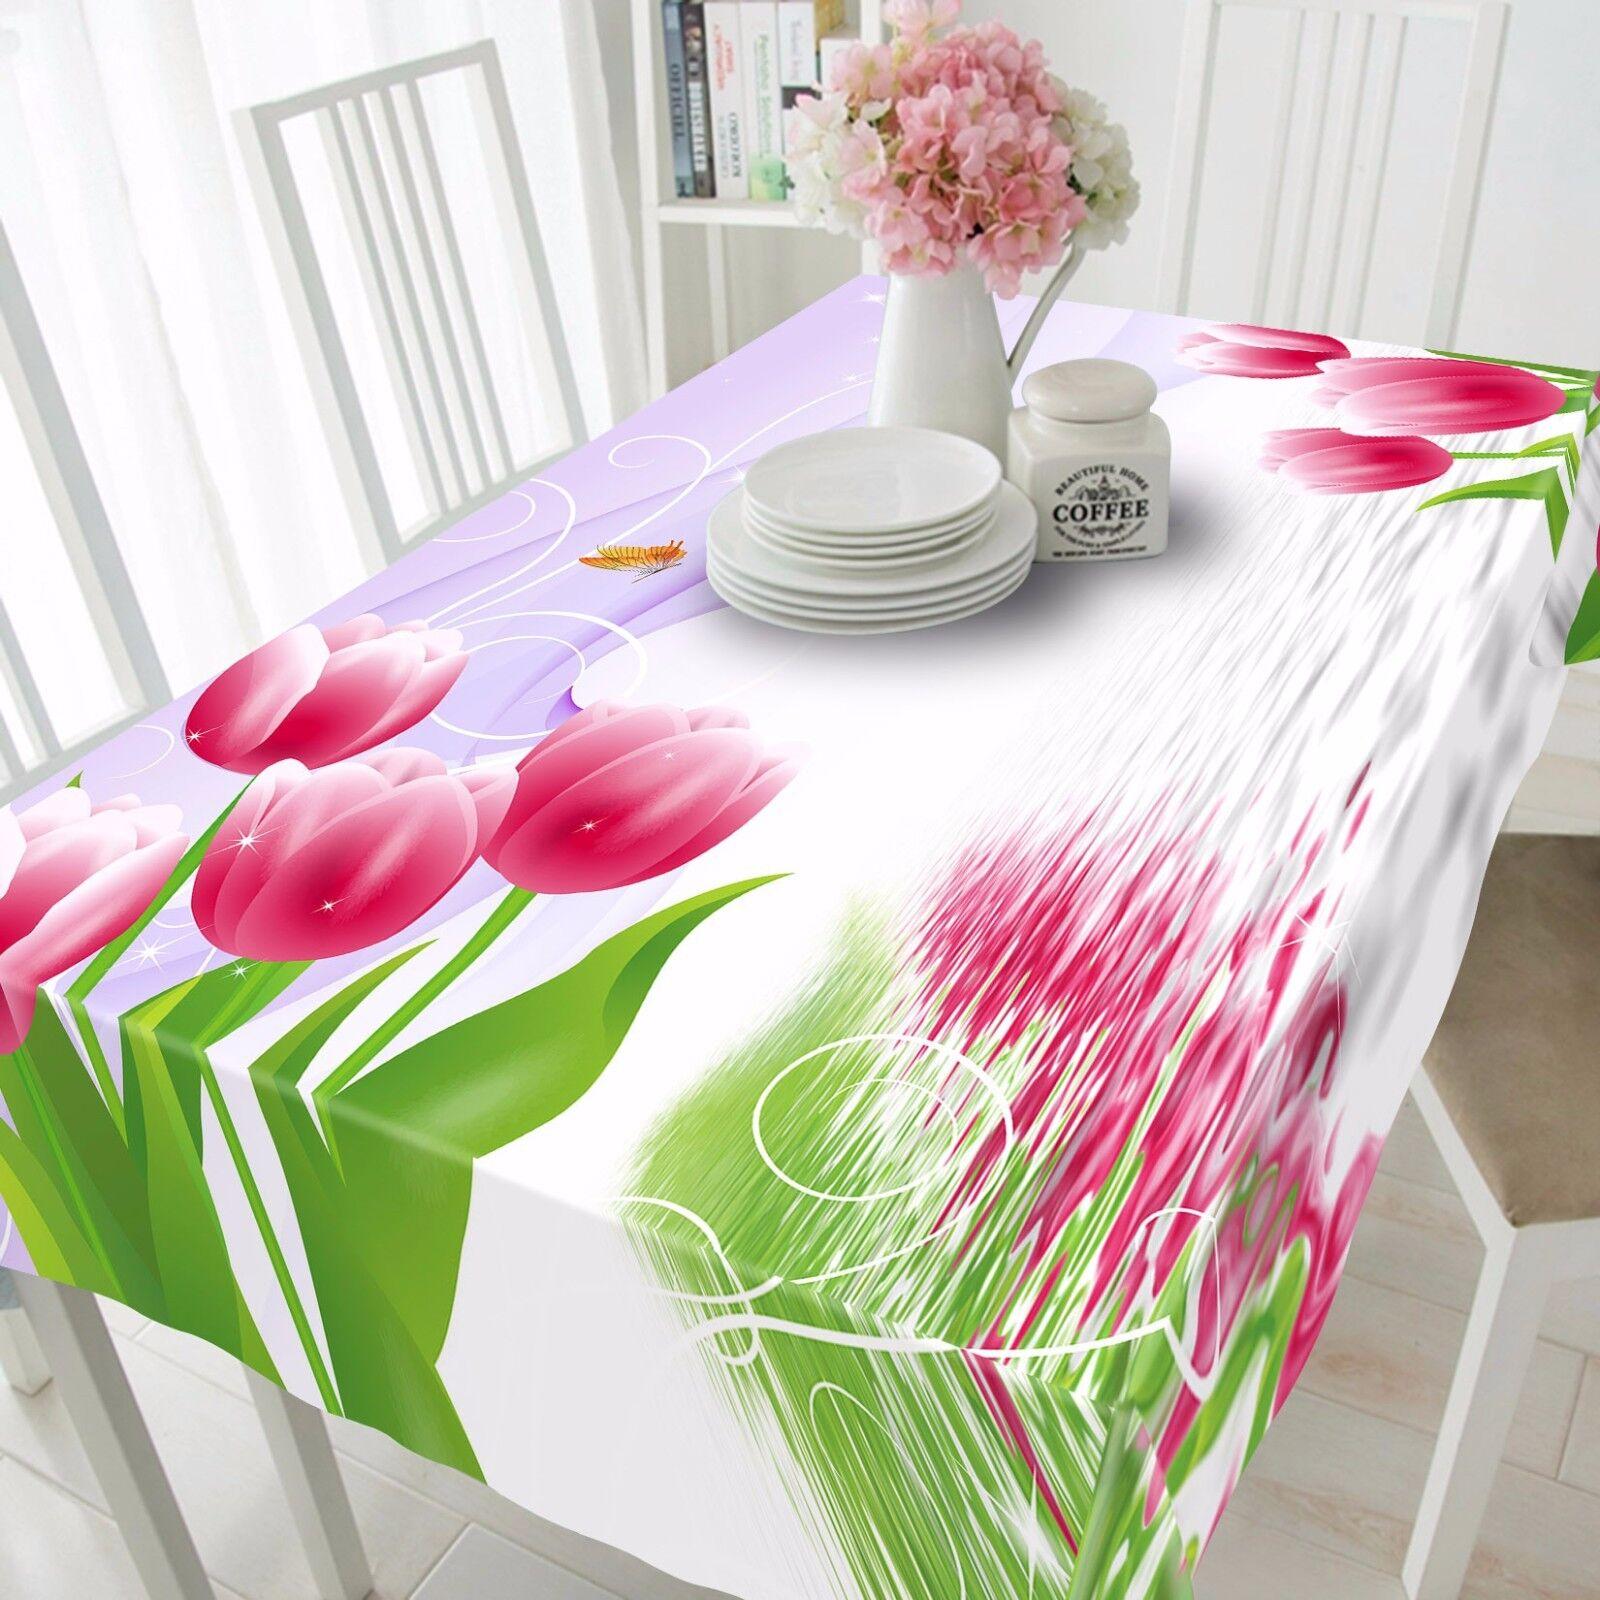 3D Petals Leaf Tablecloth Table Cover Cloth Birthday Party AJ WALLPAPER UK Lemon